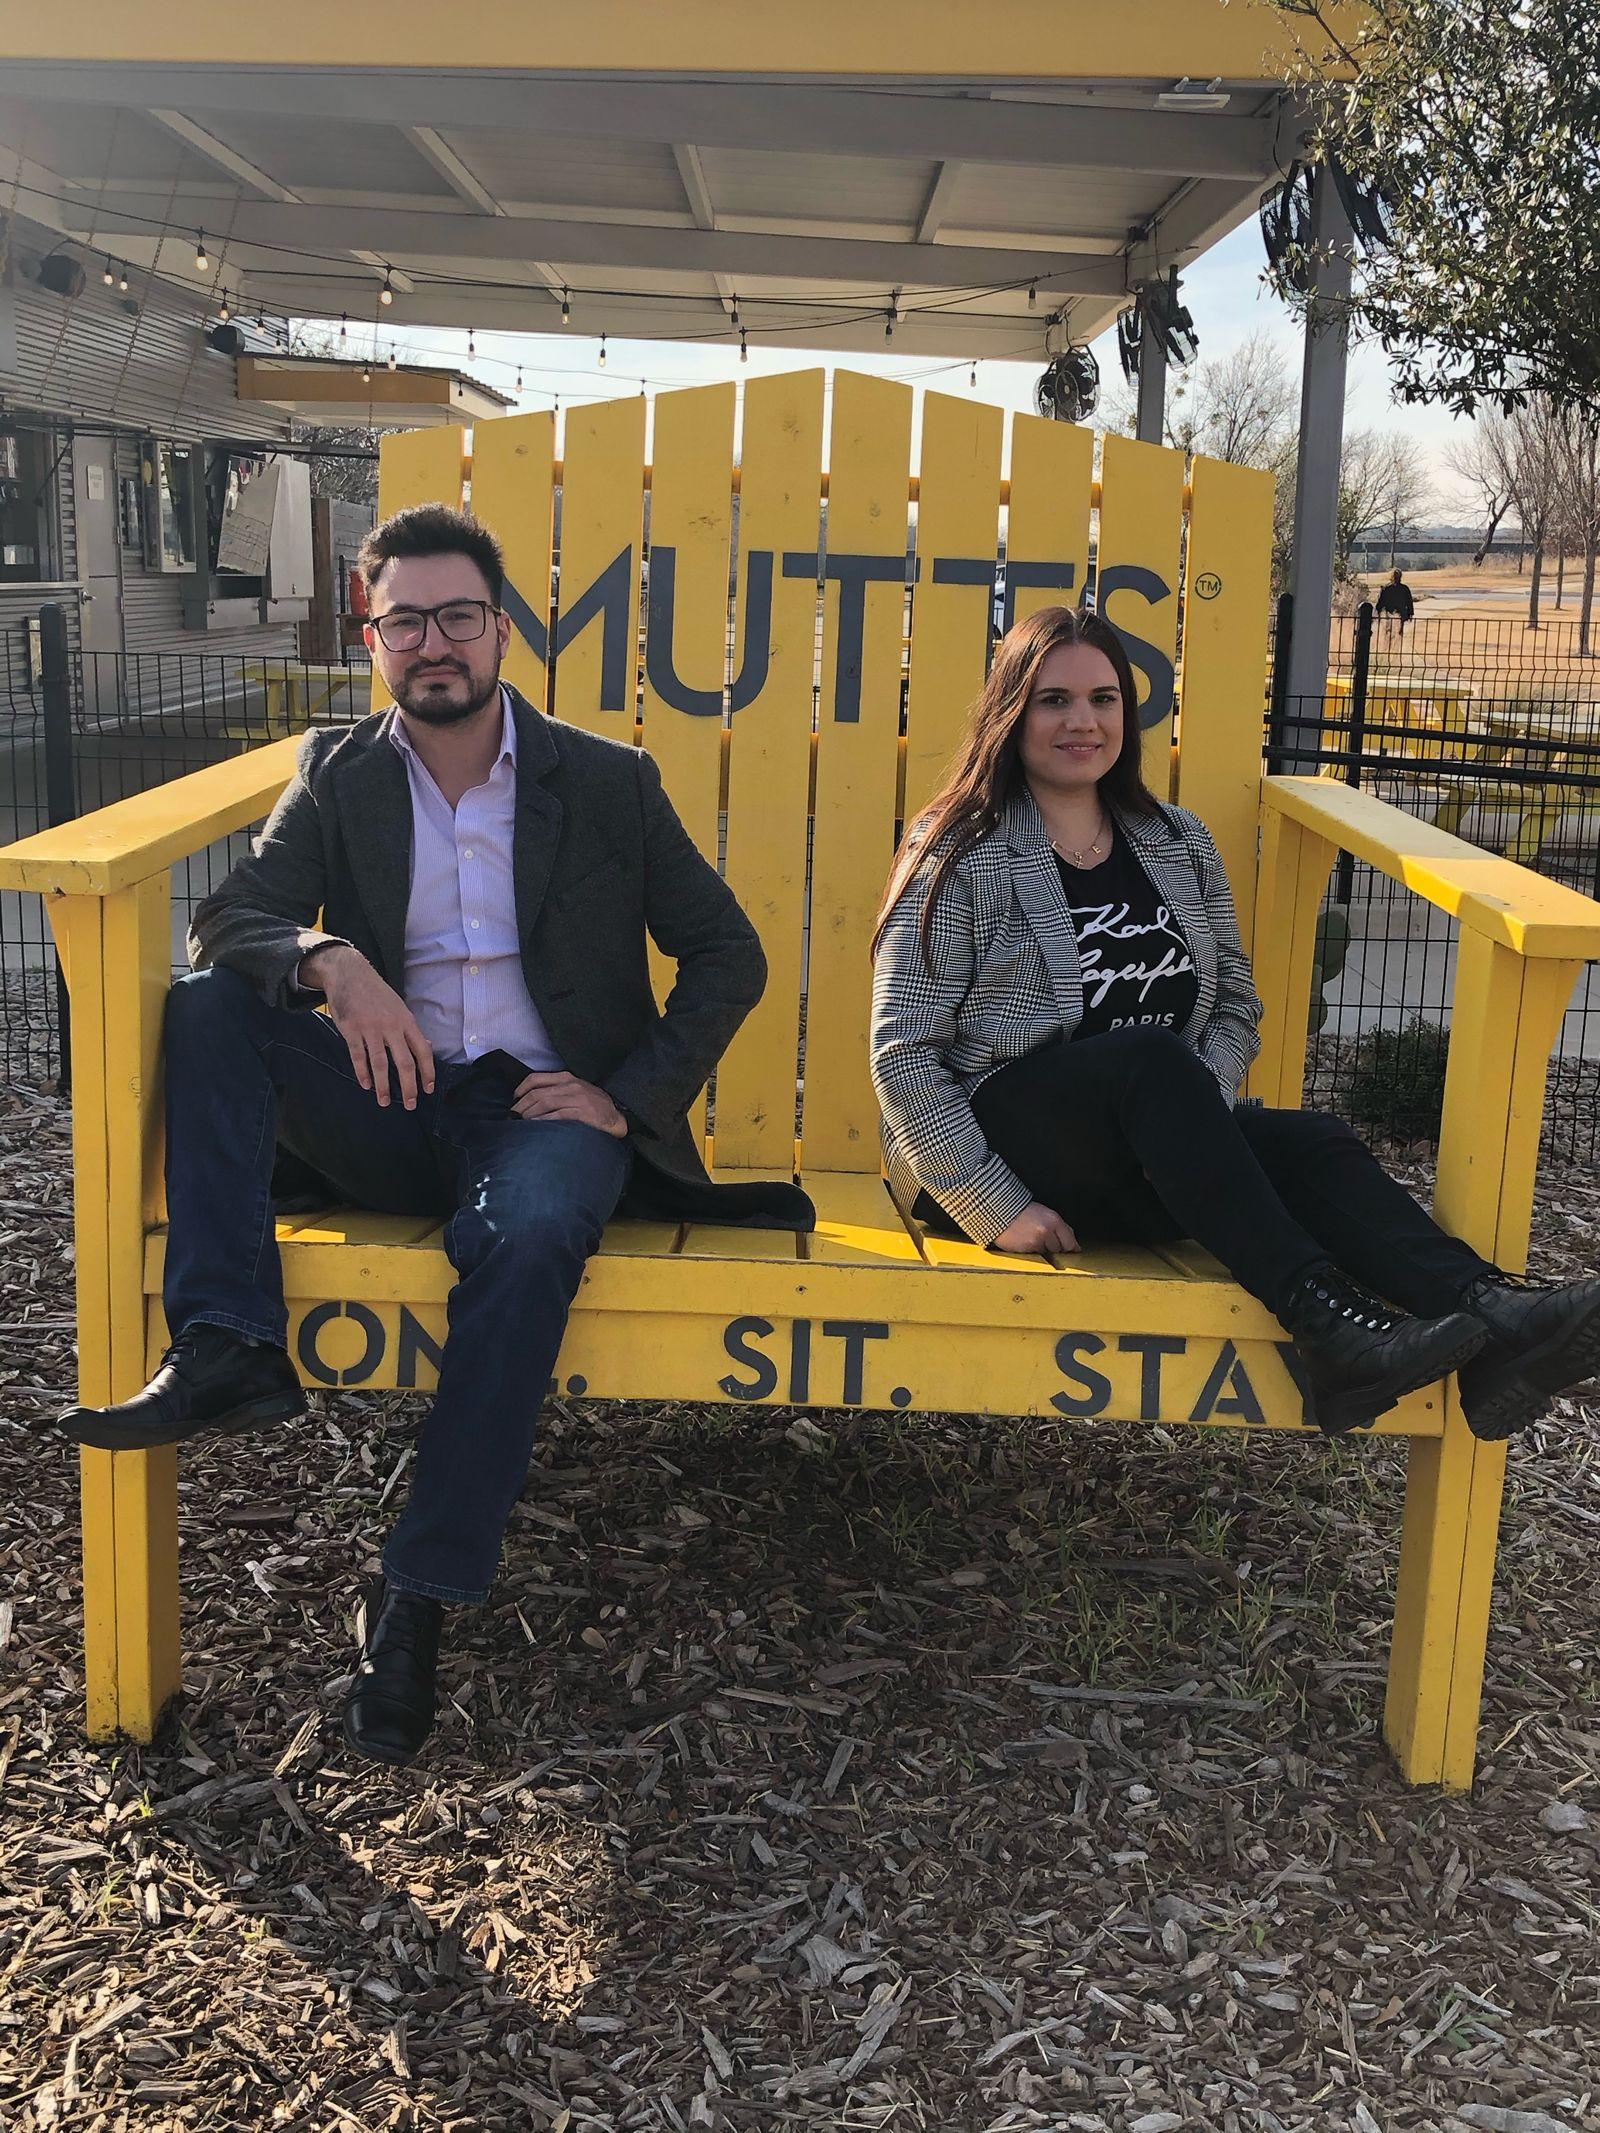 MUTTS Canine Cantina Franchise Inks Multi-Unit Deal for Phoenix, Arizona